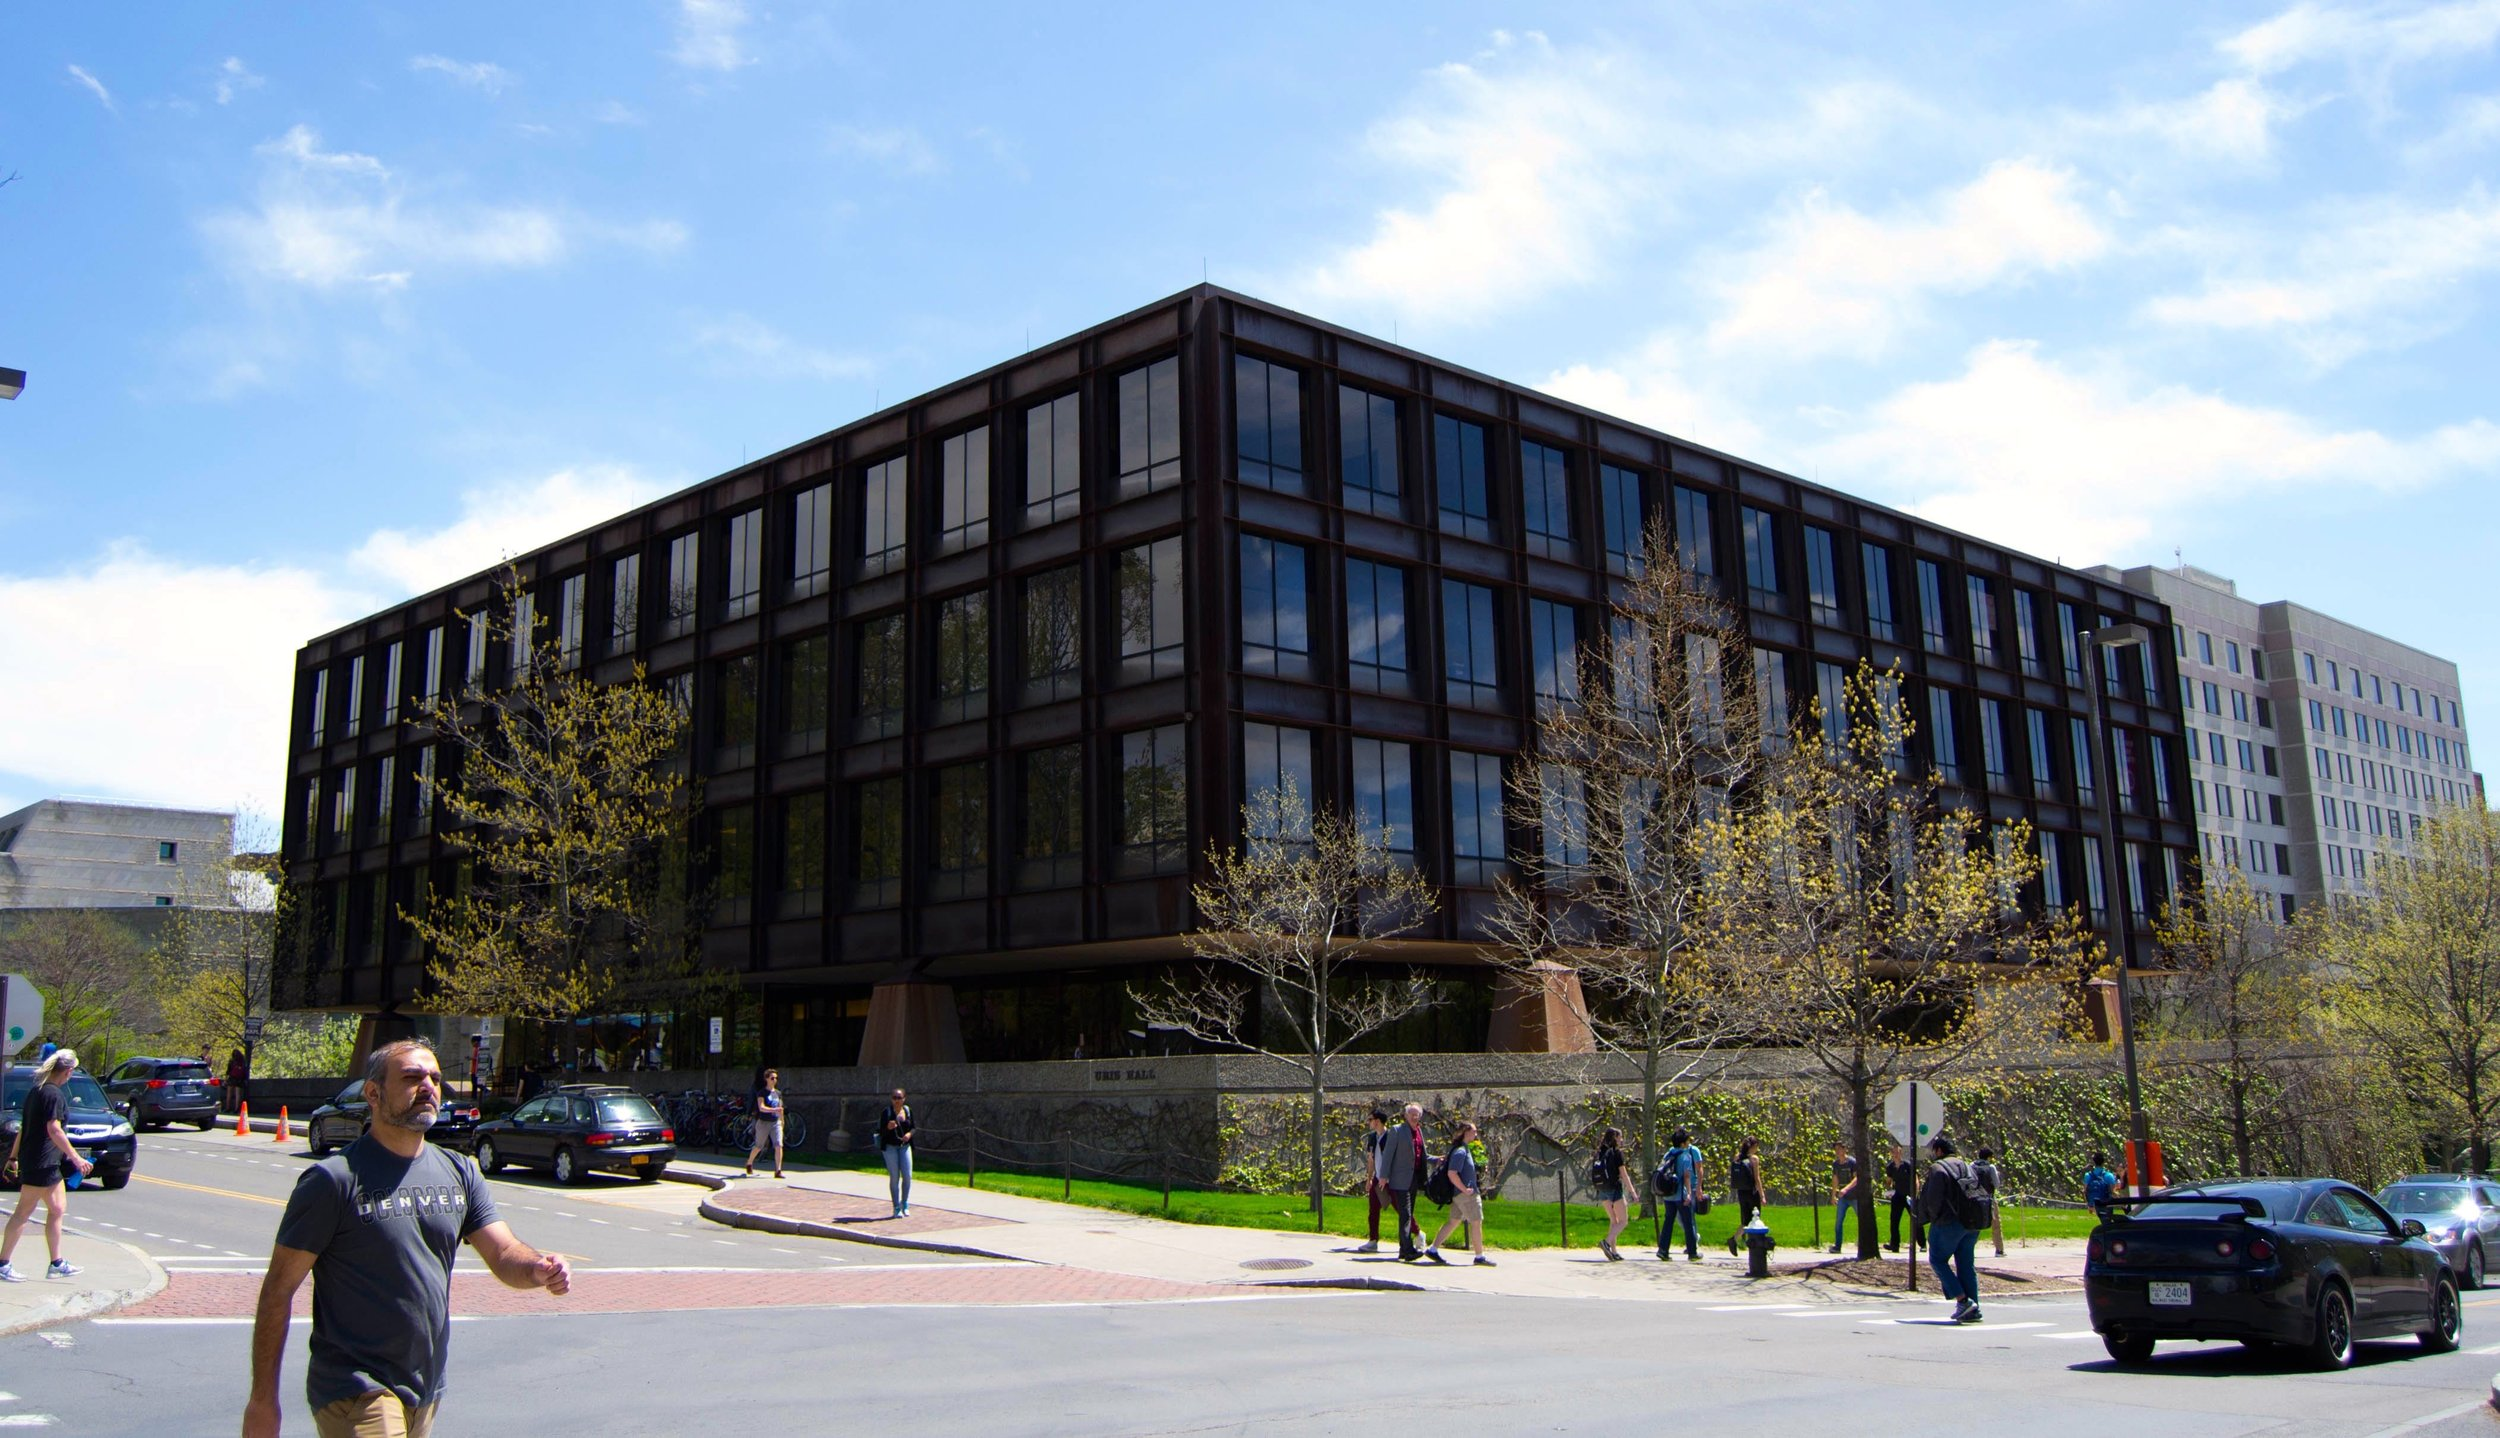 Uris Hall at Cornell University